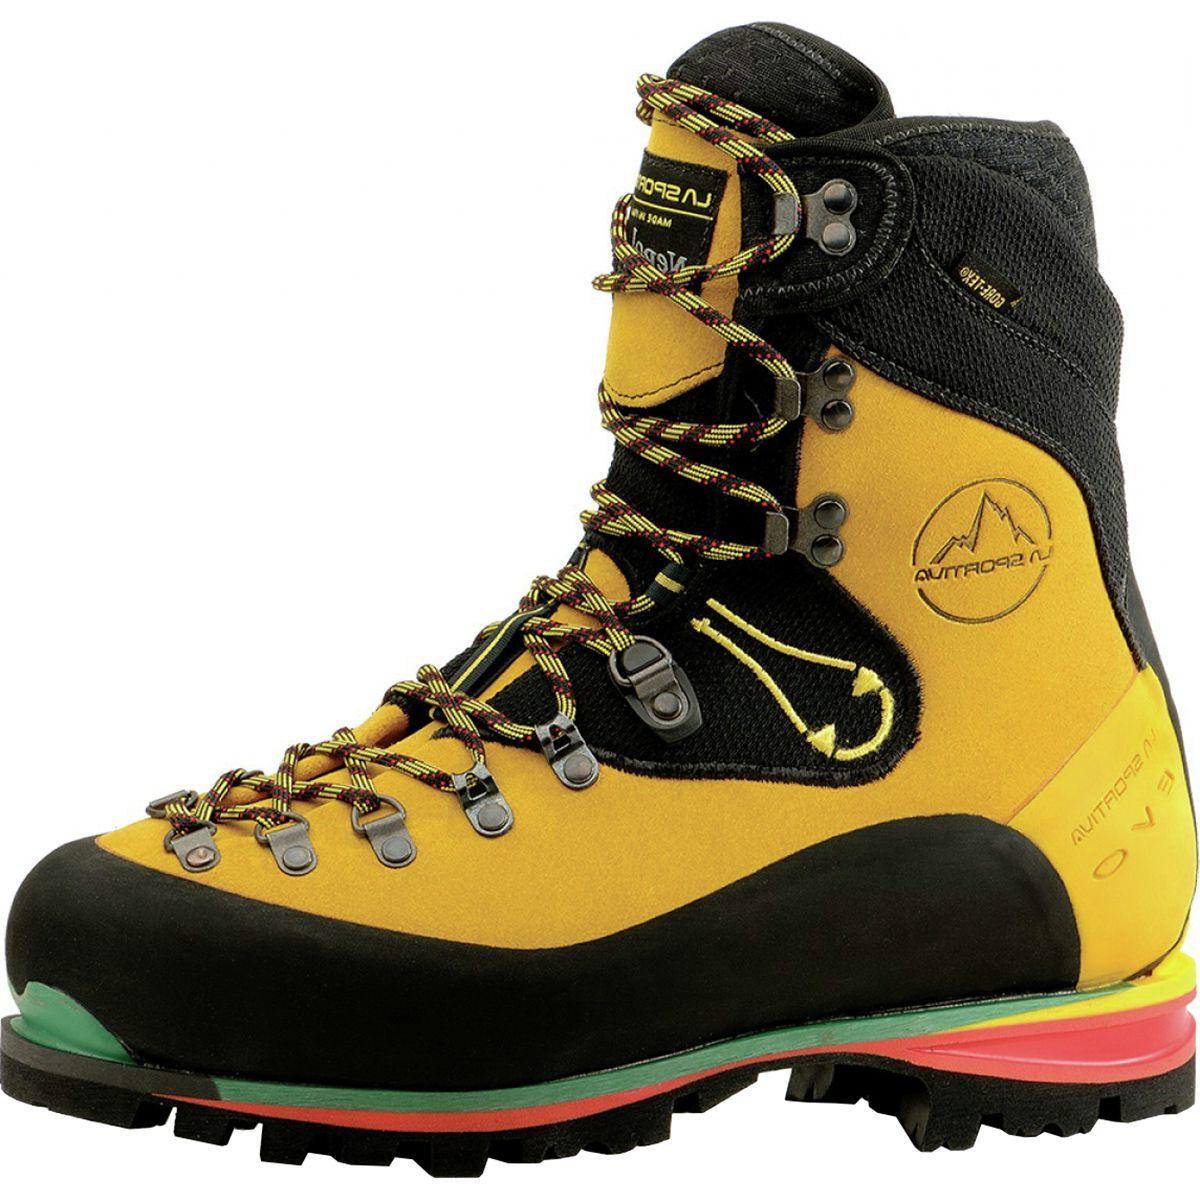 La Sportiva Nepal EVO GTX Mountaineering Boot - Men's